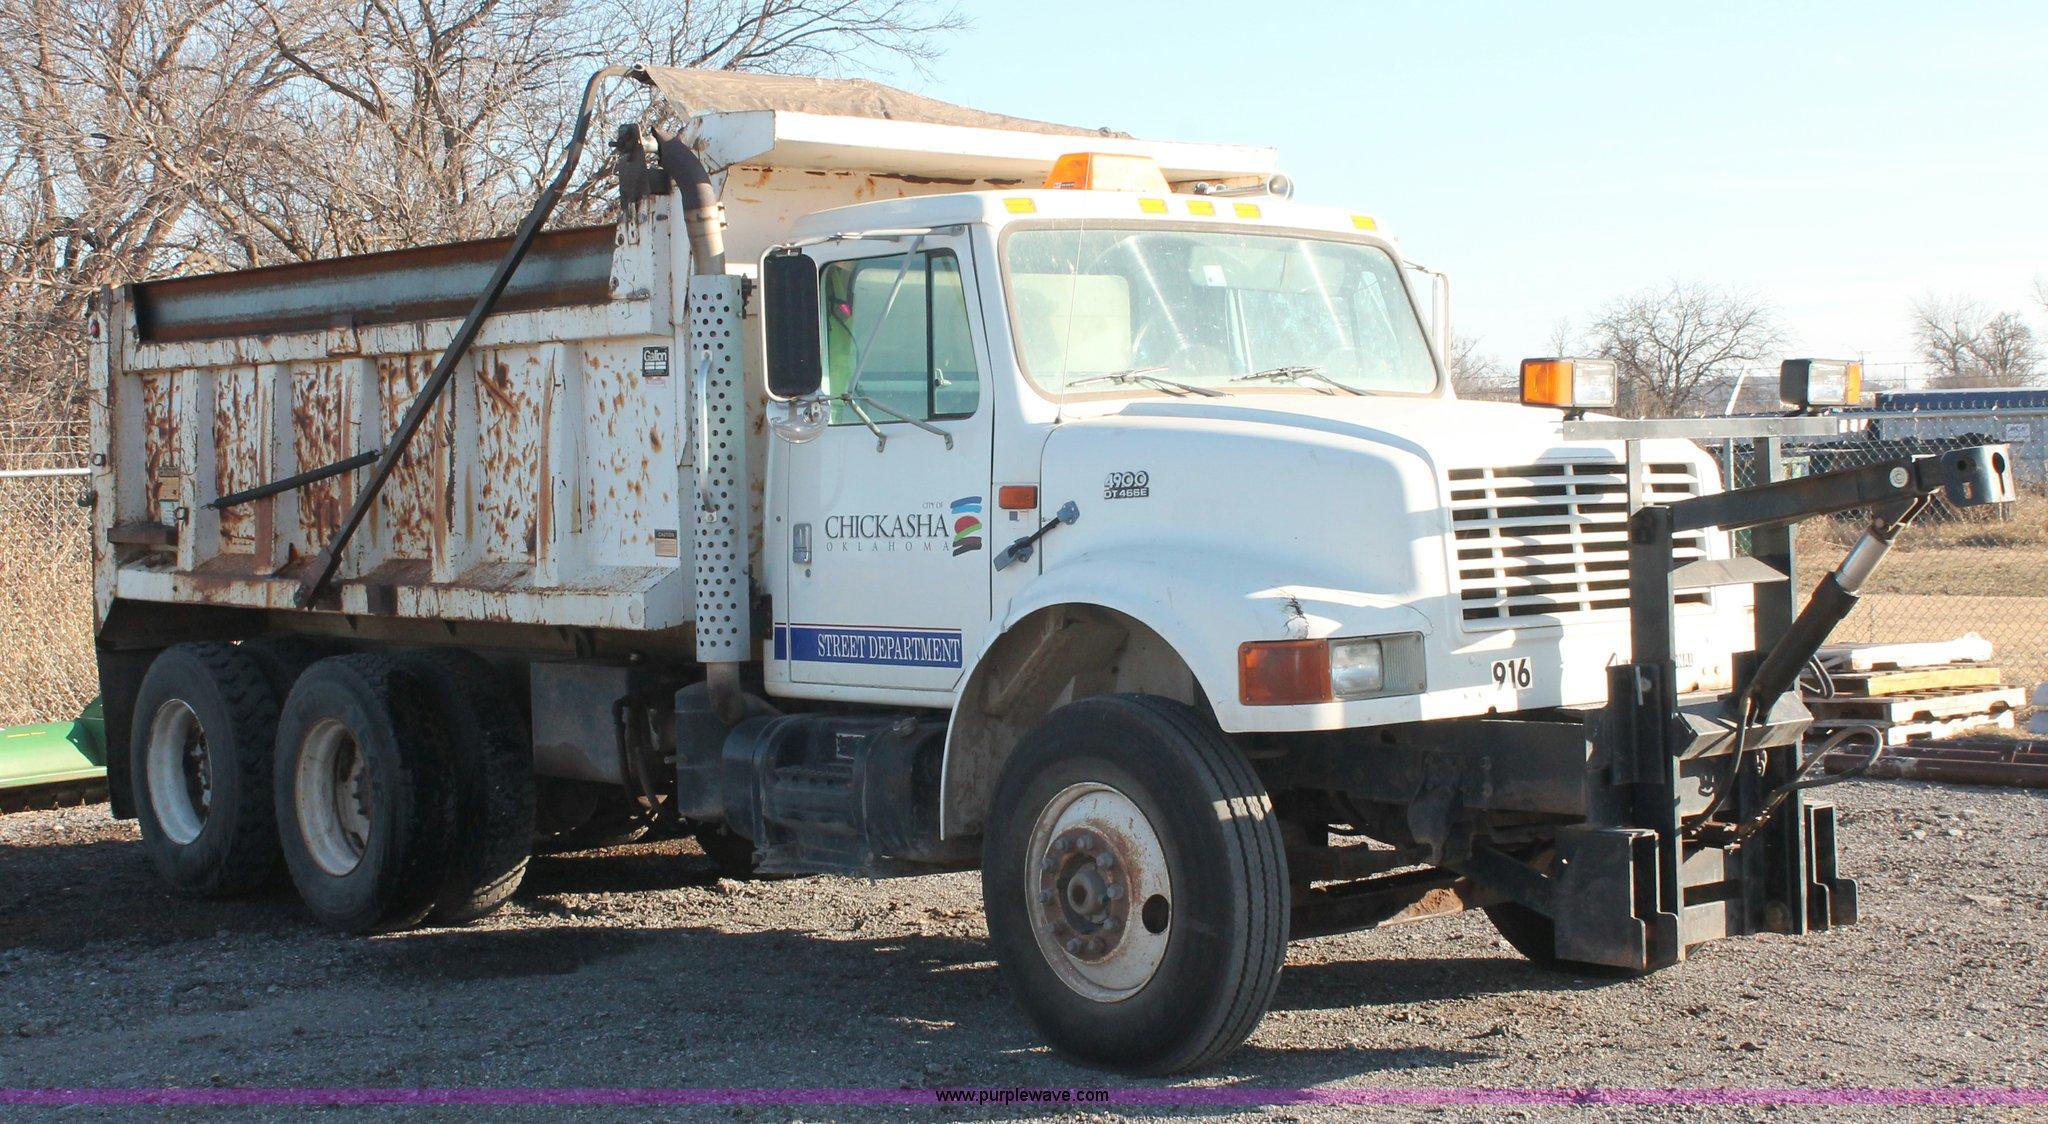 1997 International 4900 dump truck | Item AK9640 | SOLD! Jan...